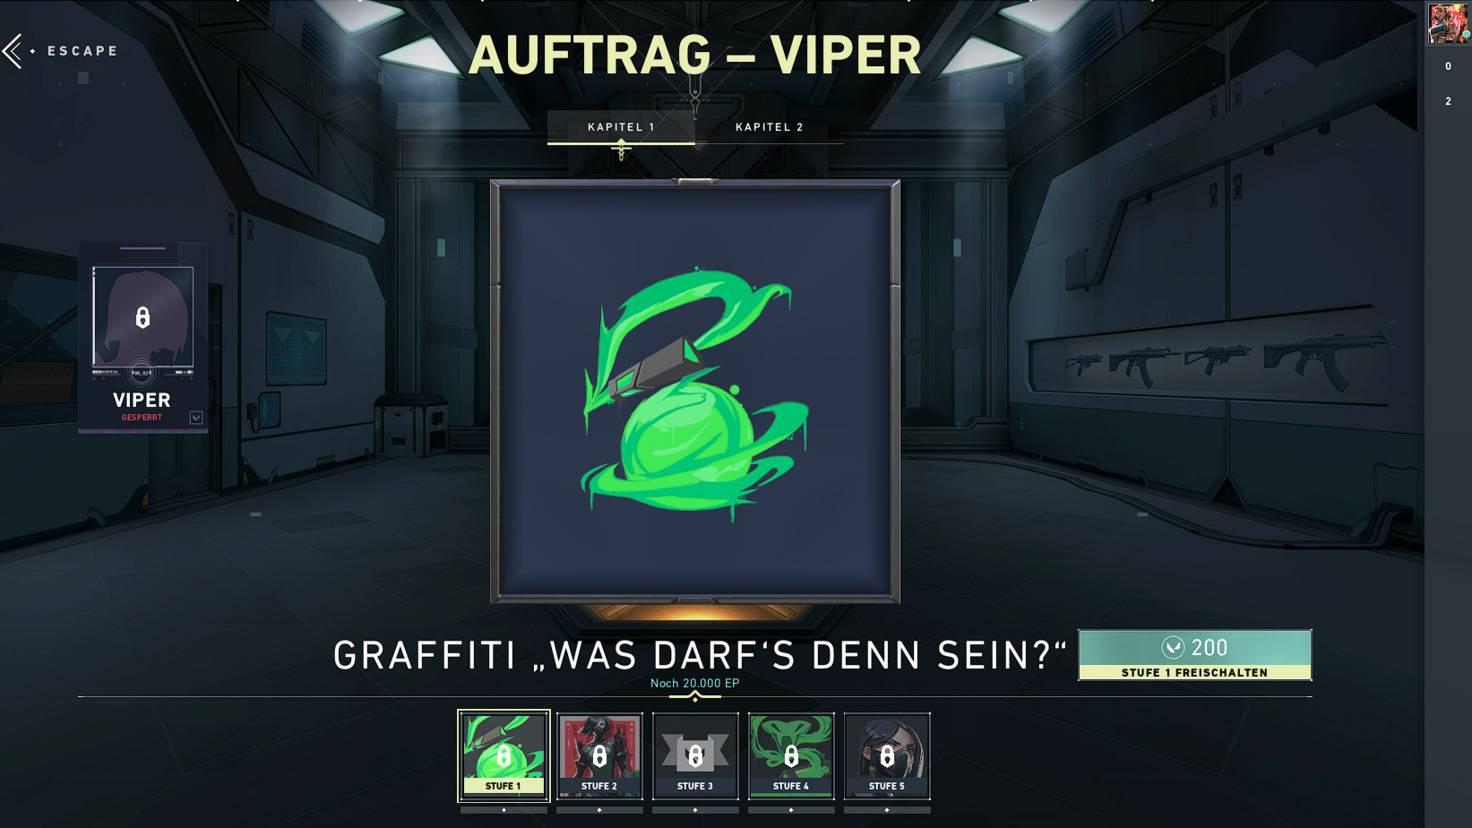 valorant-viper-auftrag